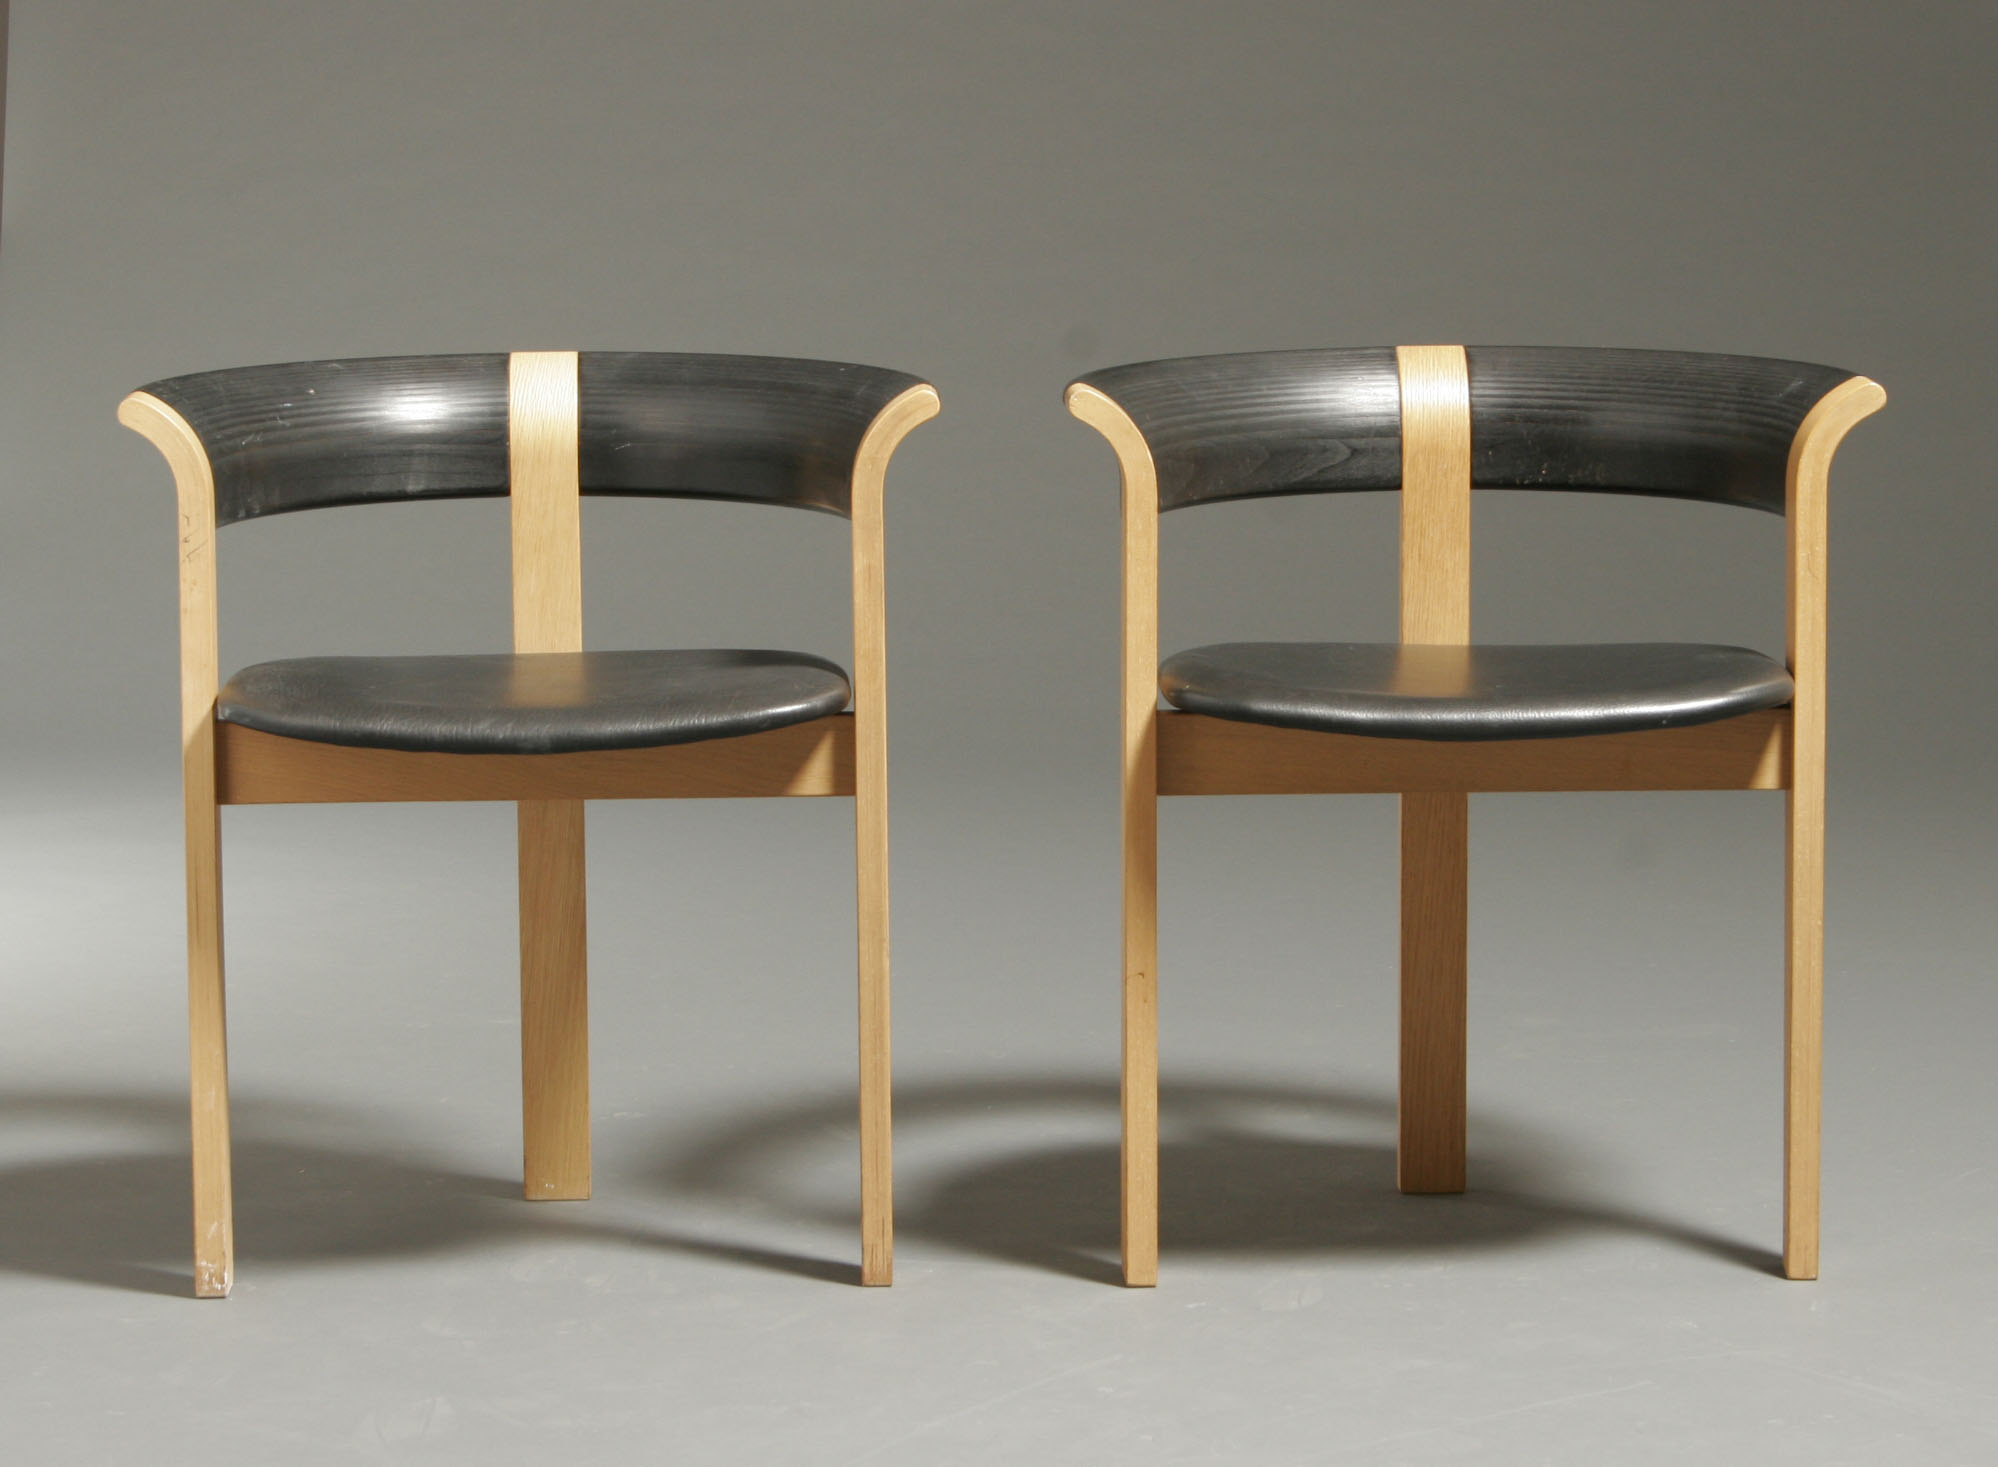 En god stol er en sjaelden eller ukendt stol Lauritzblog